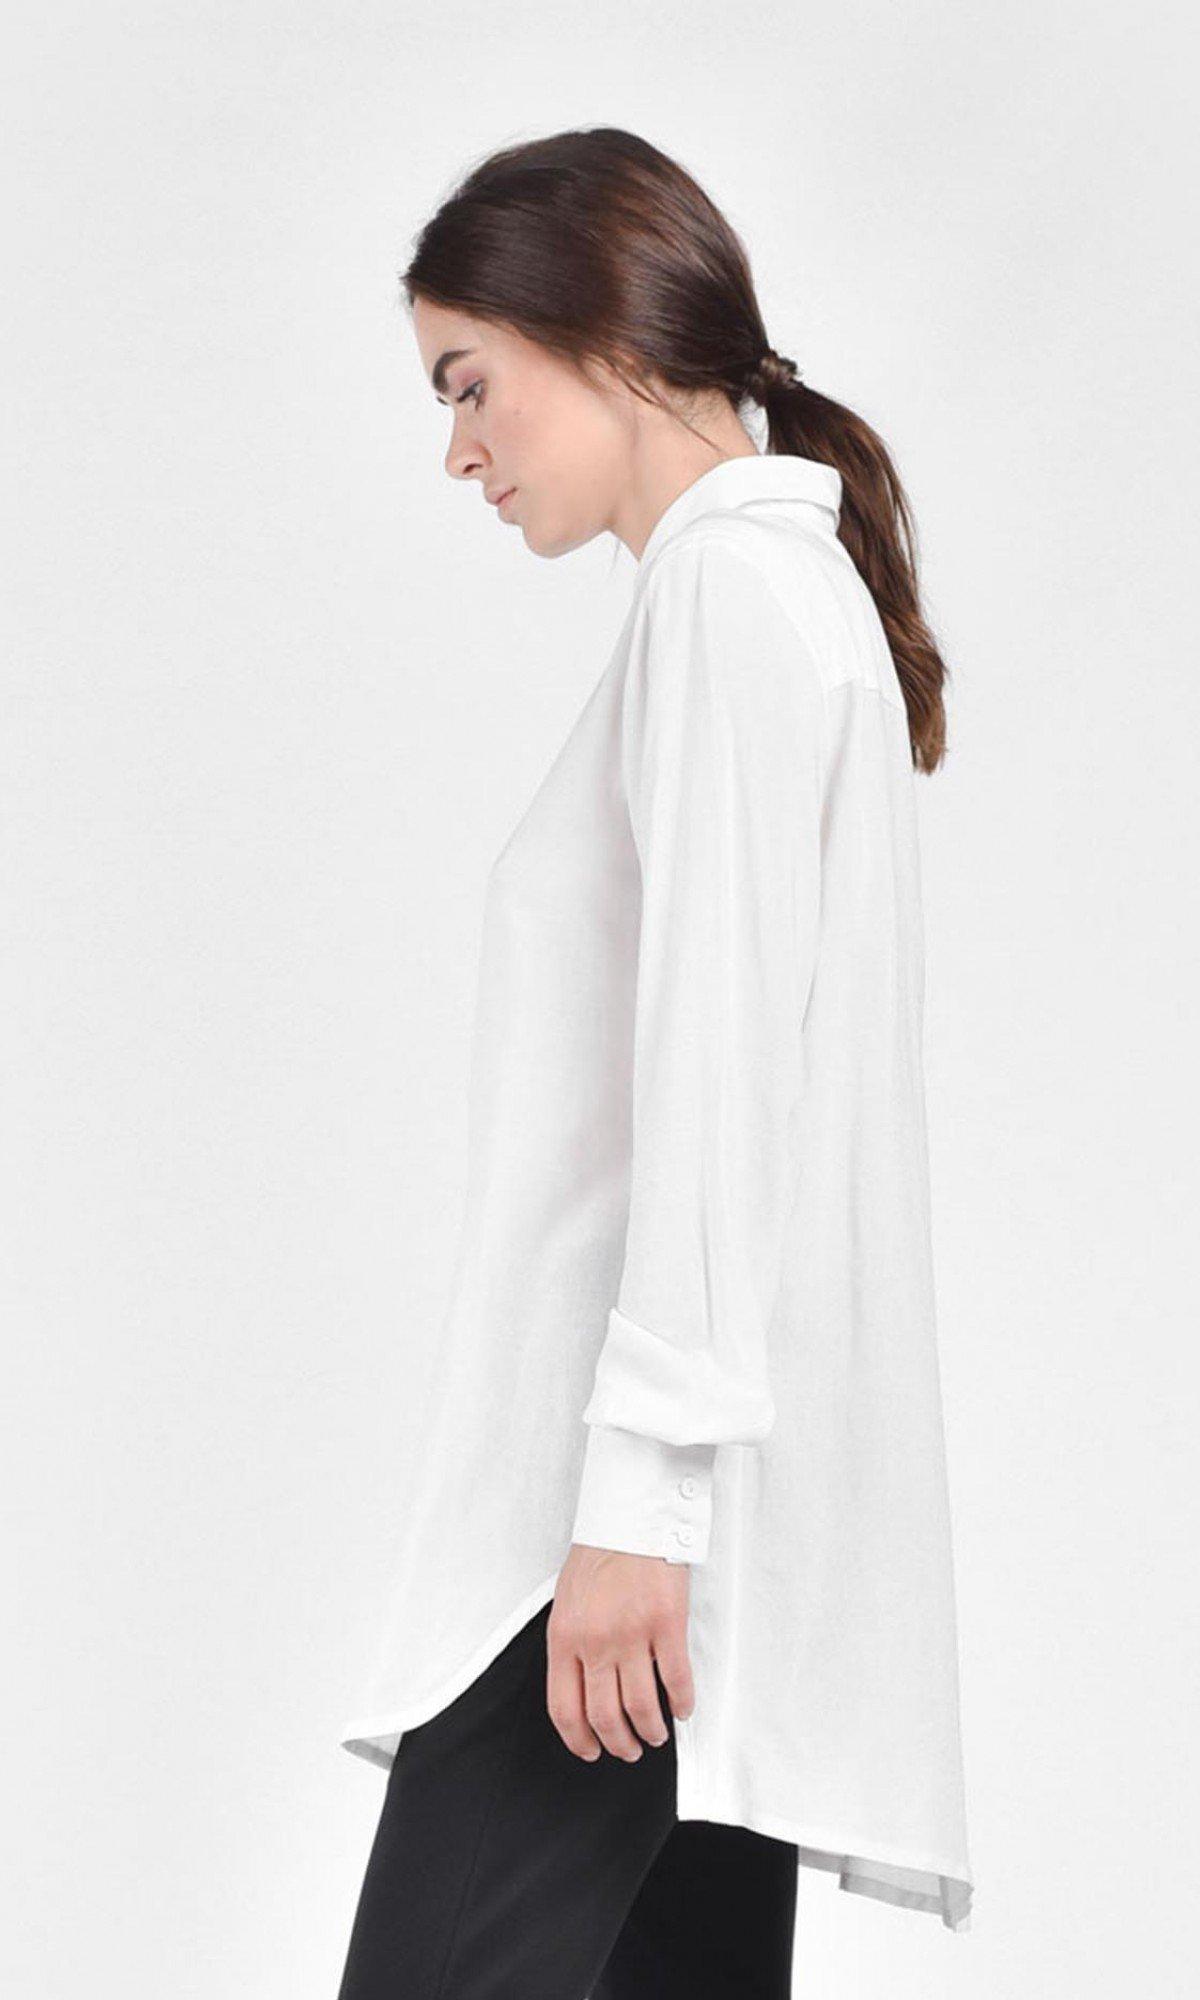 Classic Elegant White Shirt A11439